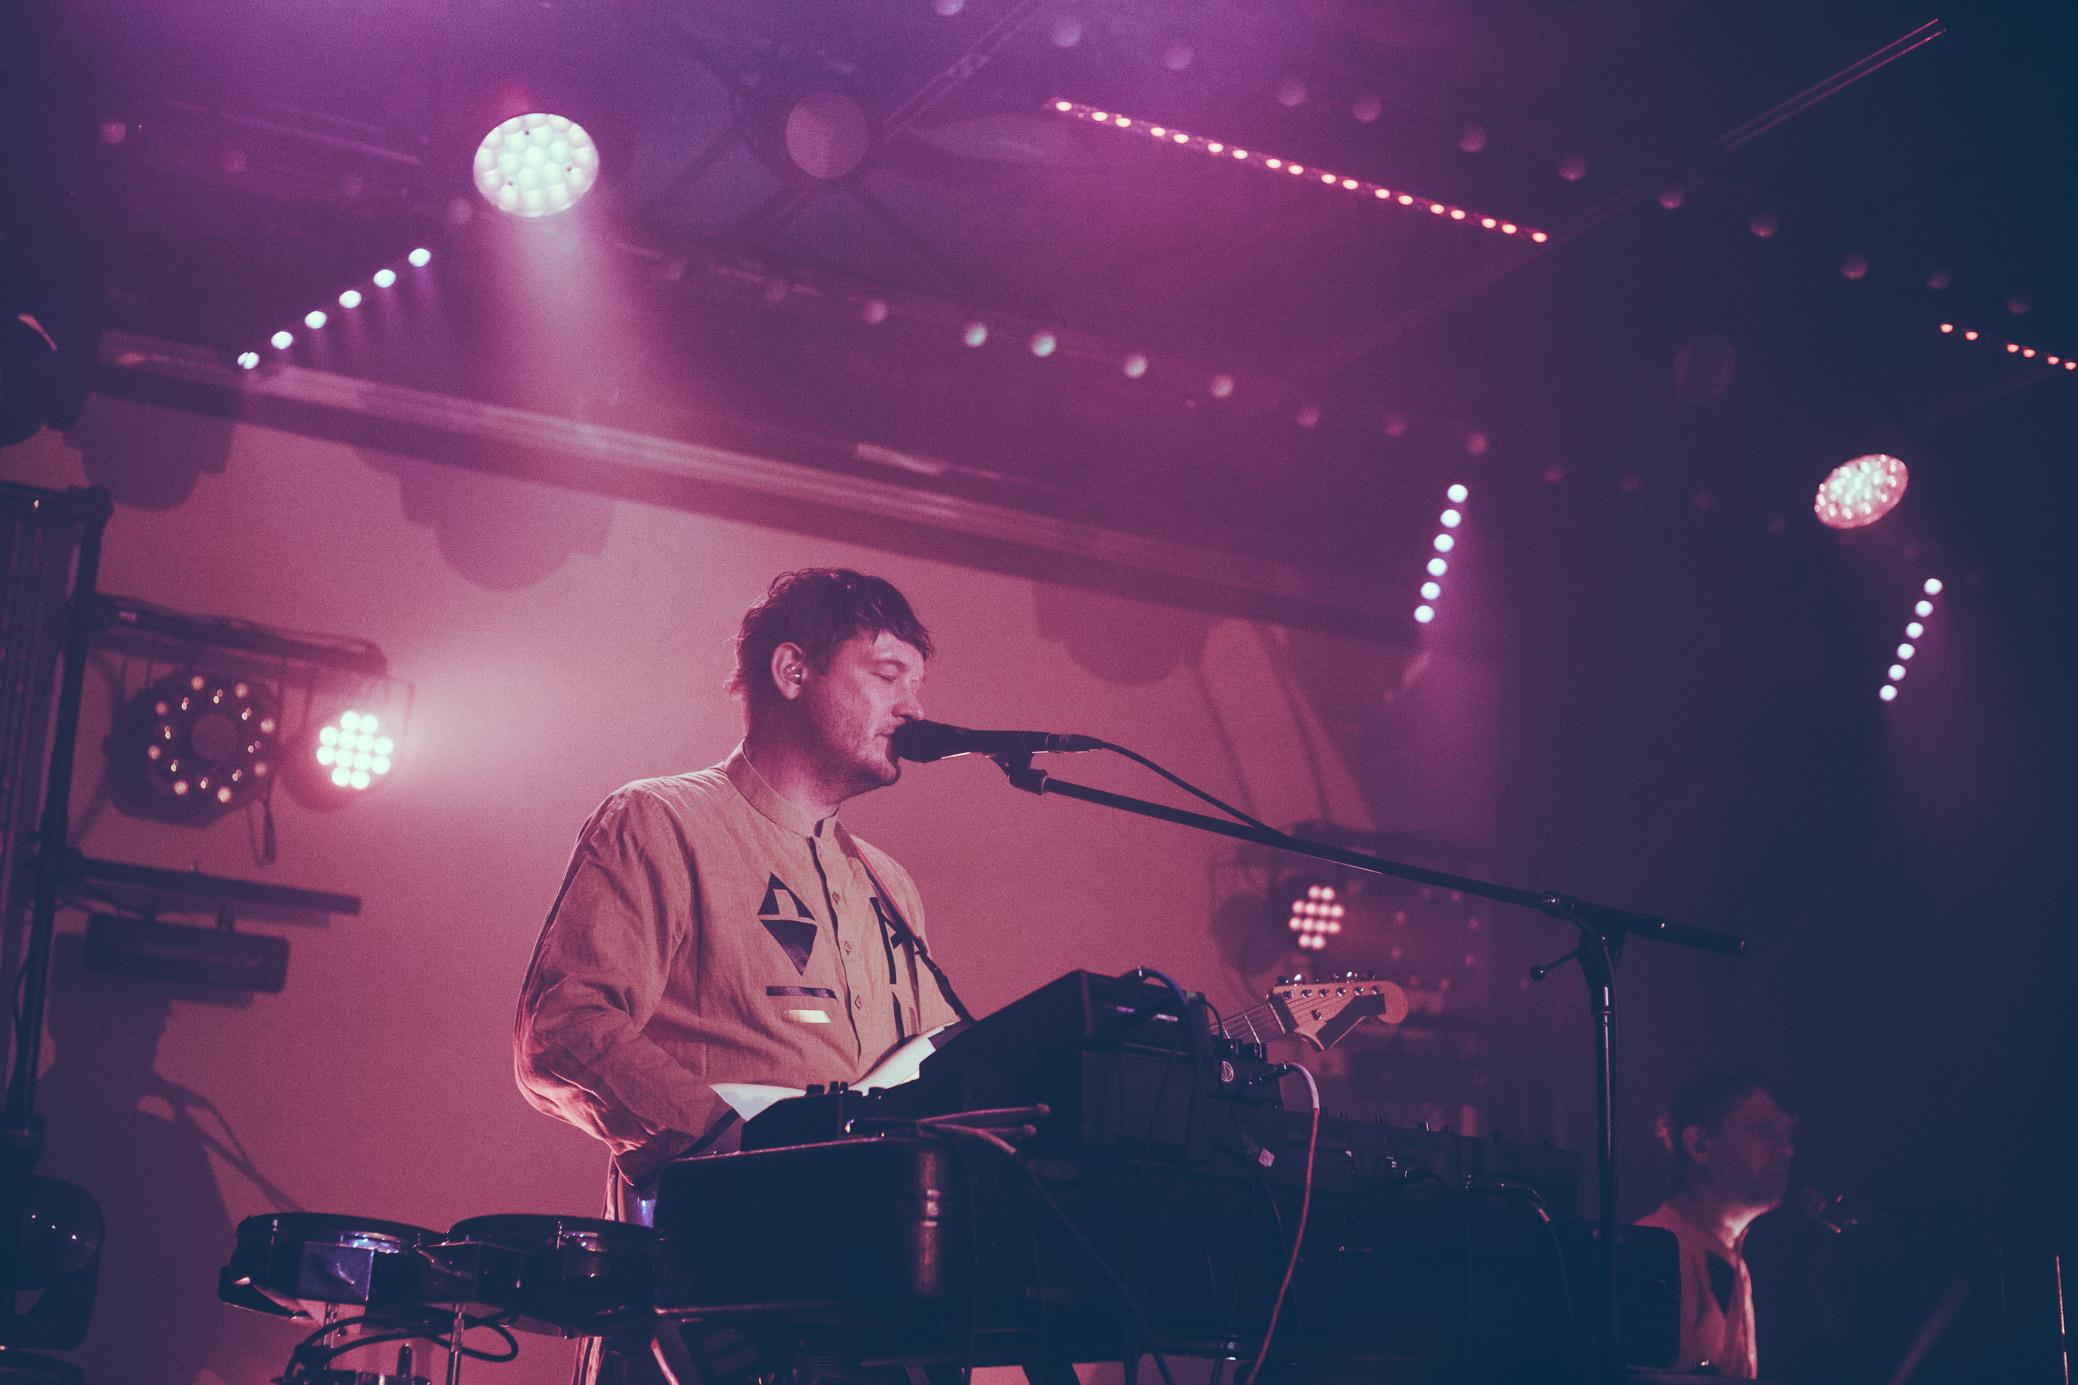 STRKFR performs in concert at Saturn Birmingham in Birmingham, Alabama on March 10th, 2019. (Photo by David A. Smith / DSmithScenes)